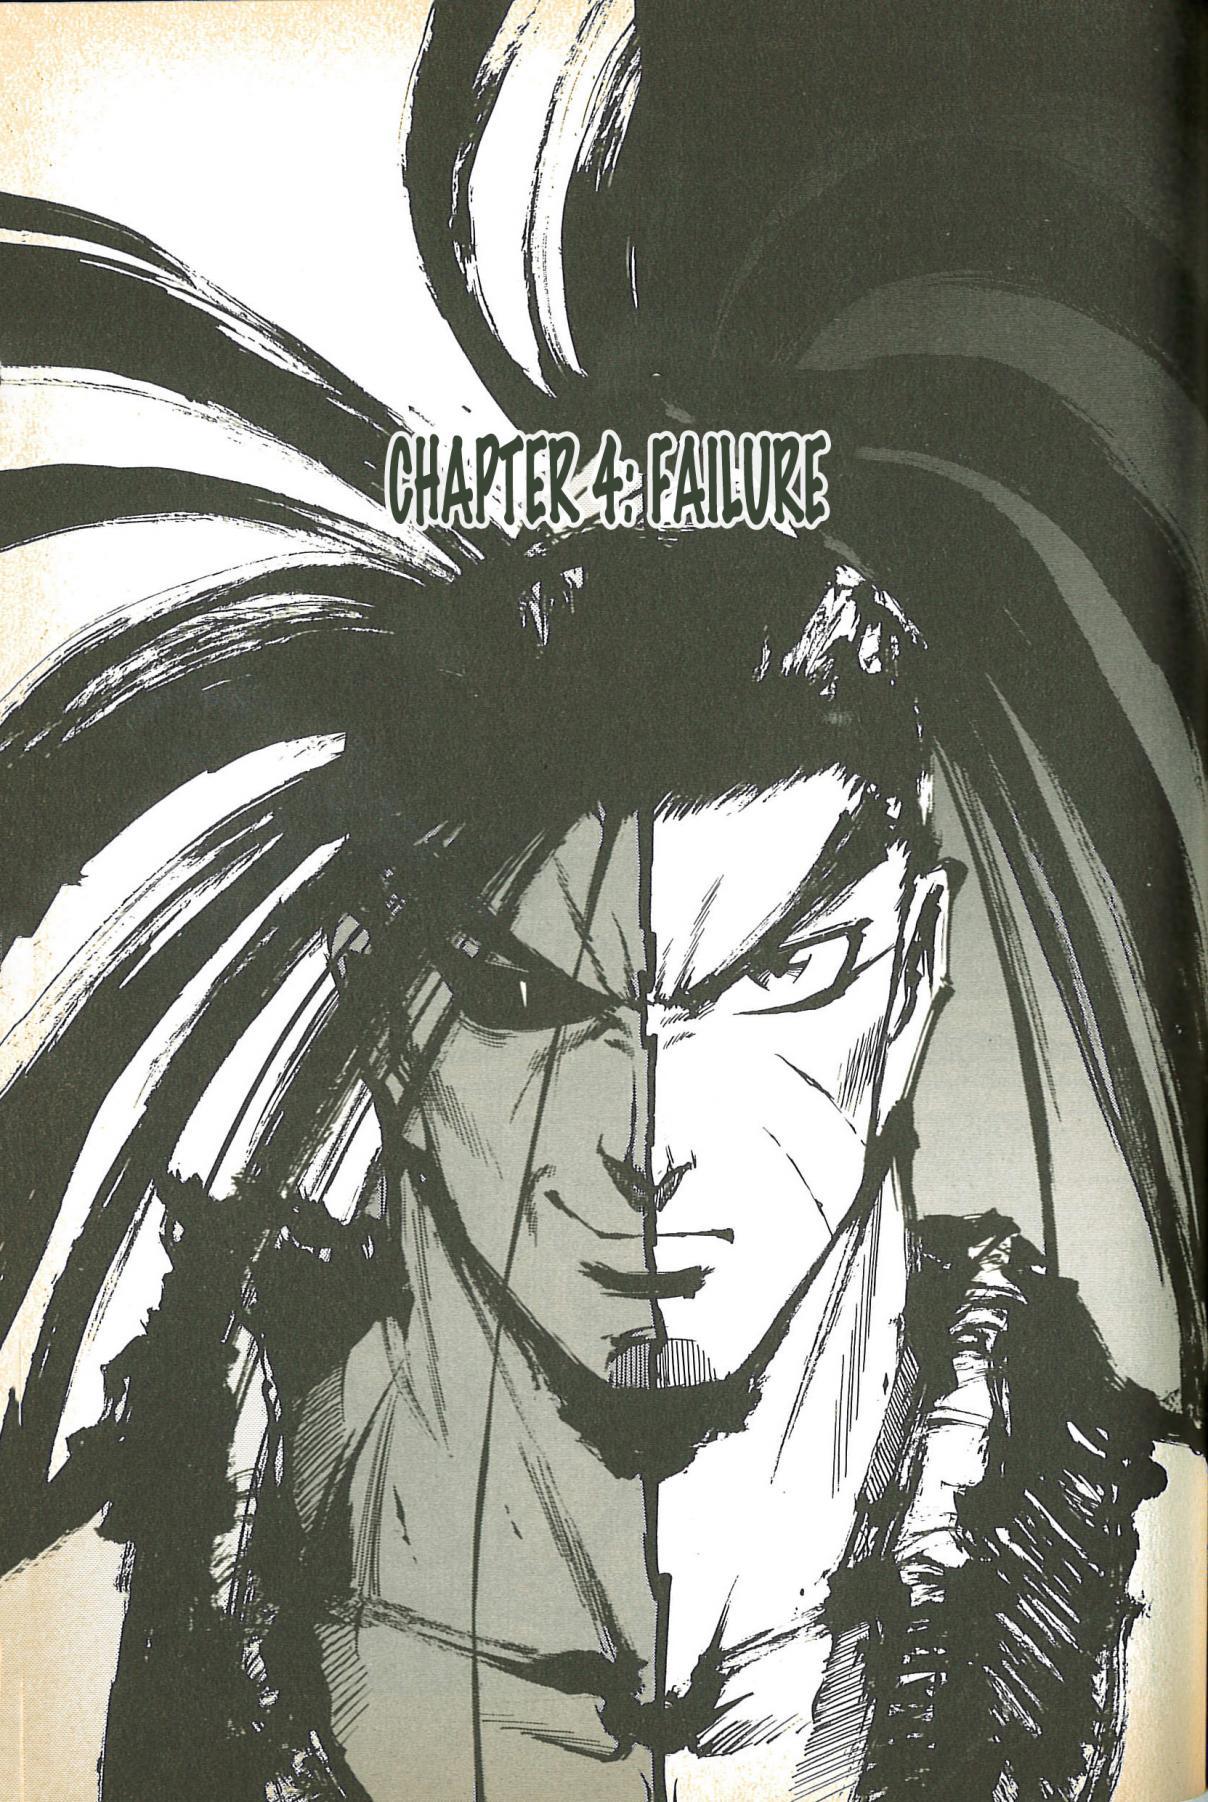 https://img2.nineanime.com/comics/pic1/14/23374/559047/c242c59ea6d0177cb5d99ad2d30ef446.jpg Page 1